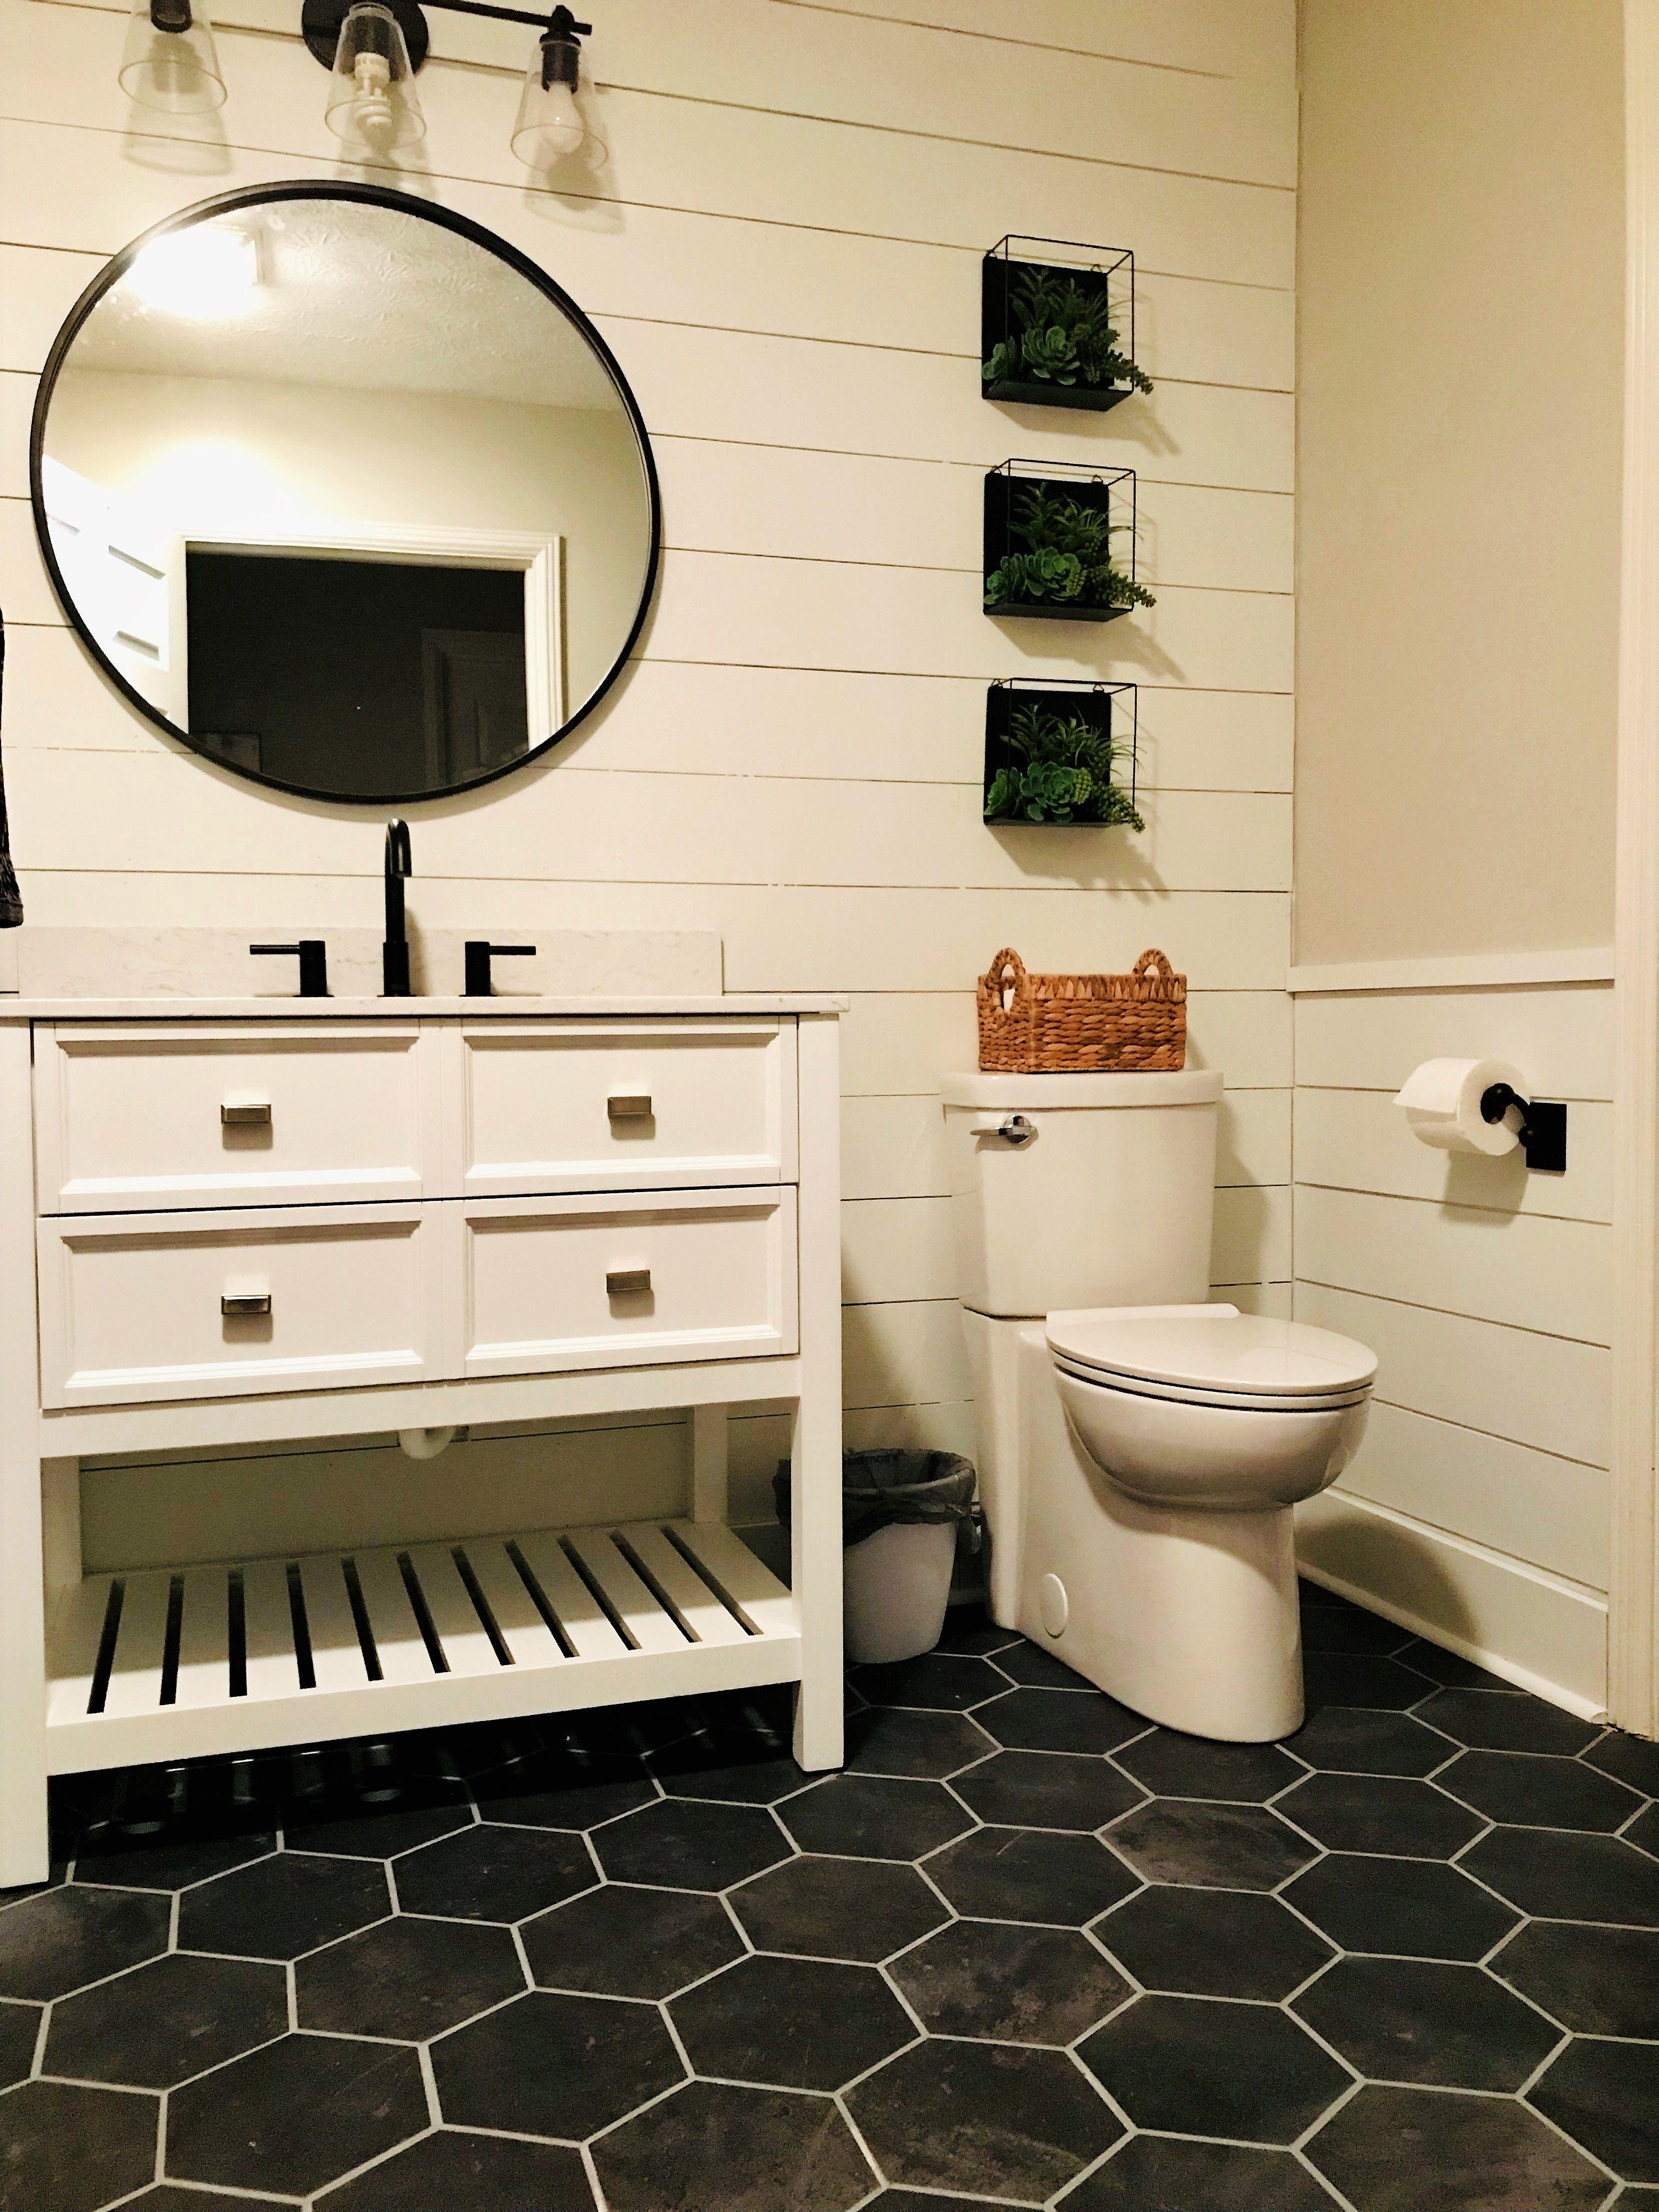 Updated Main Bathroom Peel and stick vinyl, Vinyl tile